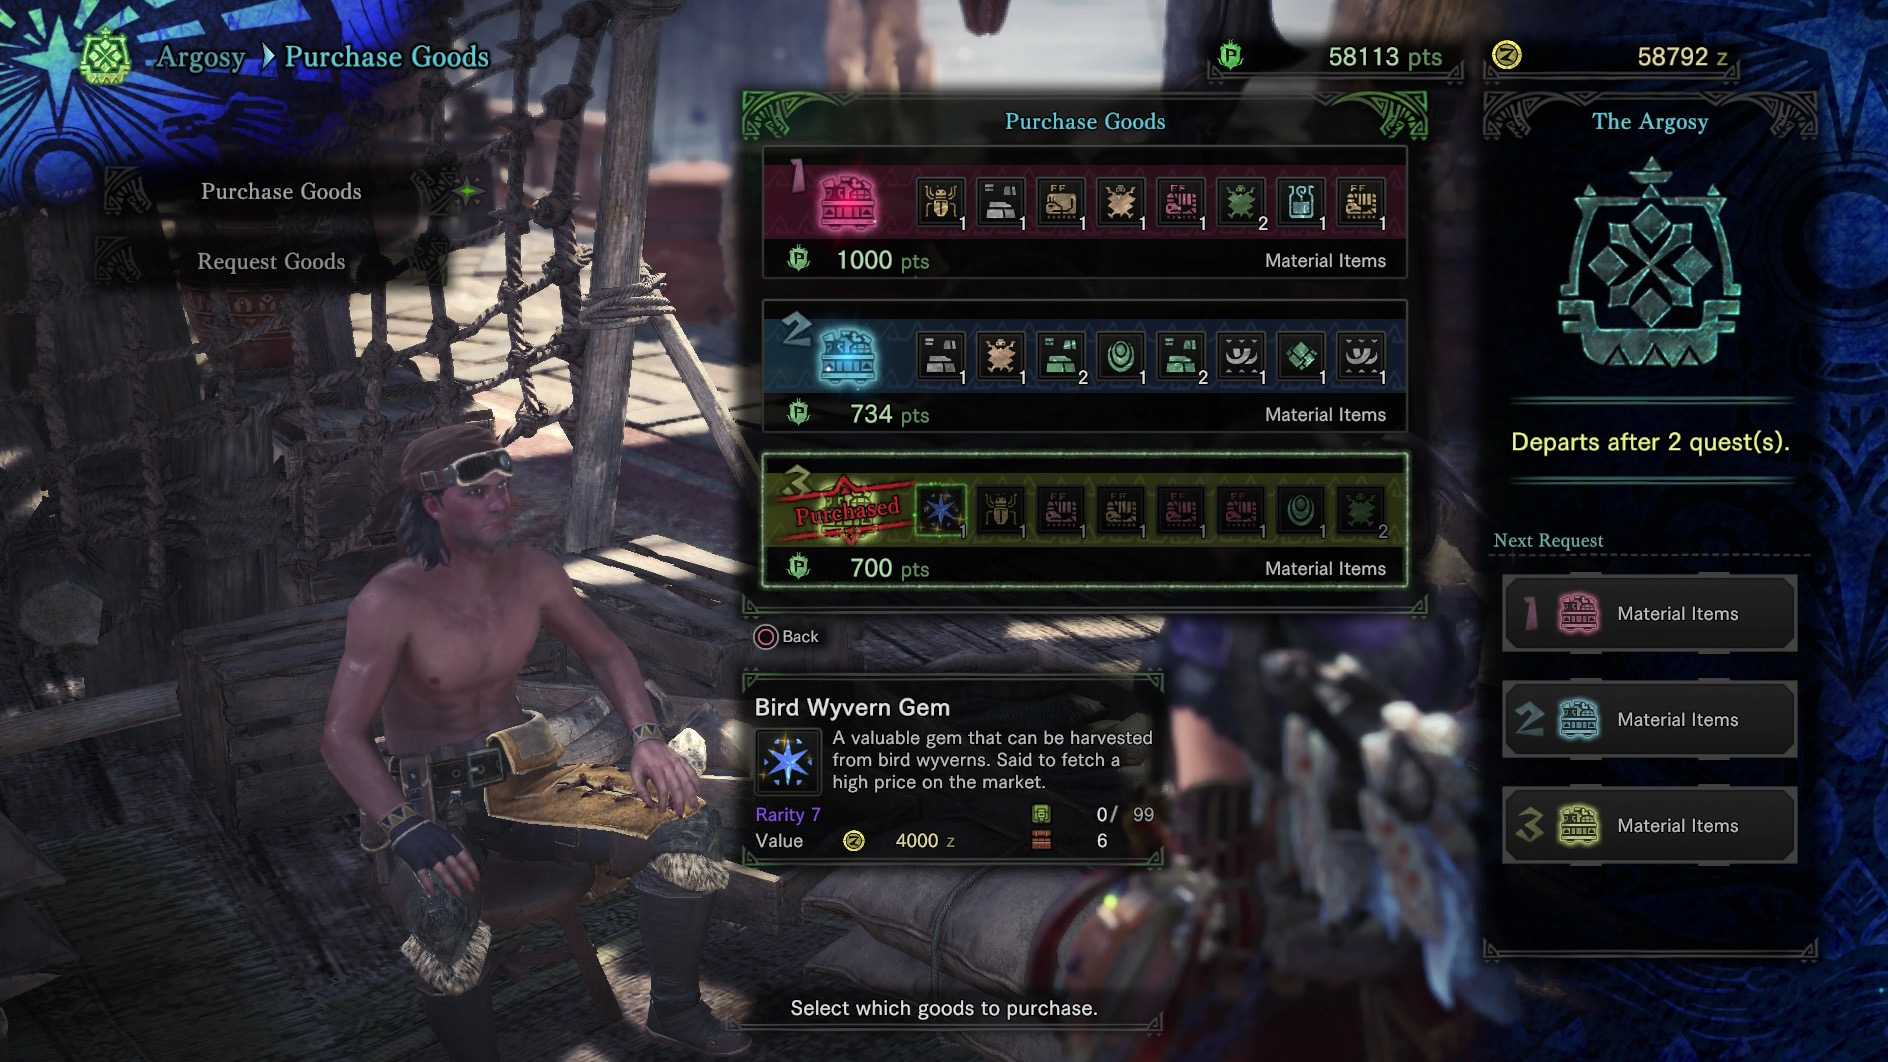 Monster Hunter: World - Rare Drop Farming Guide - Just Push